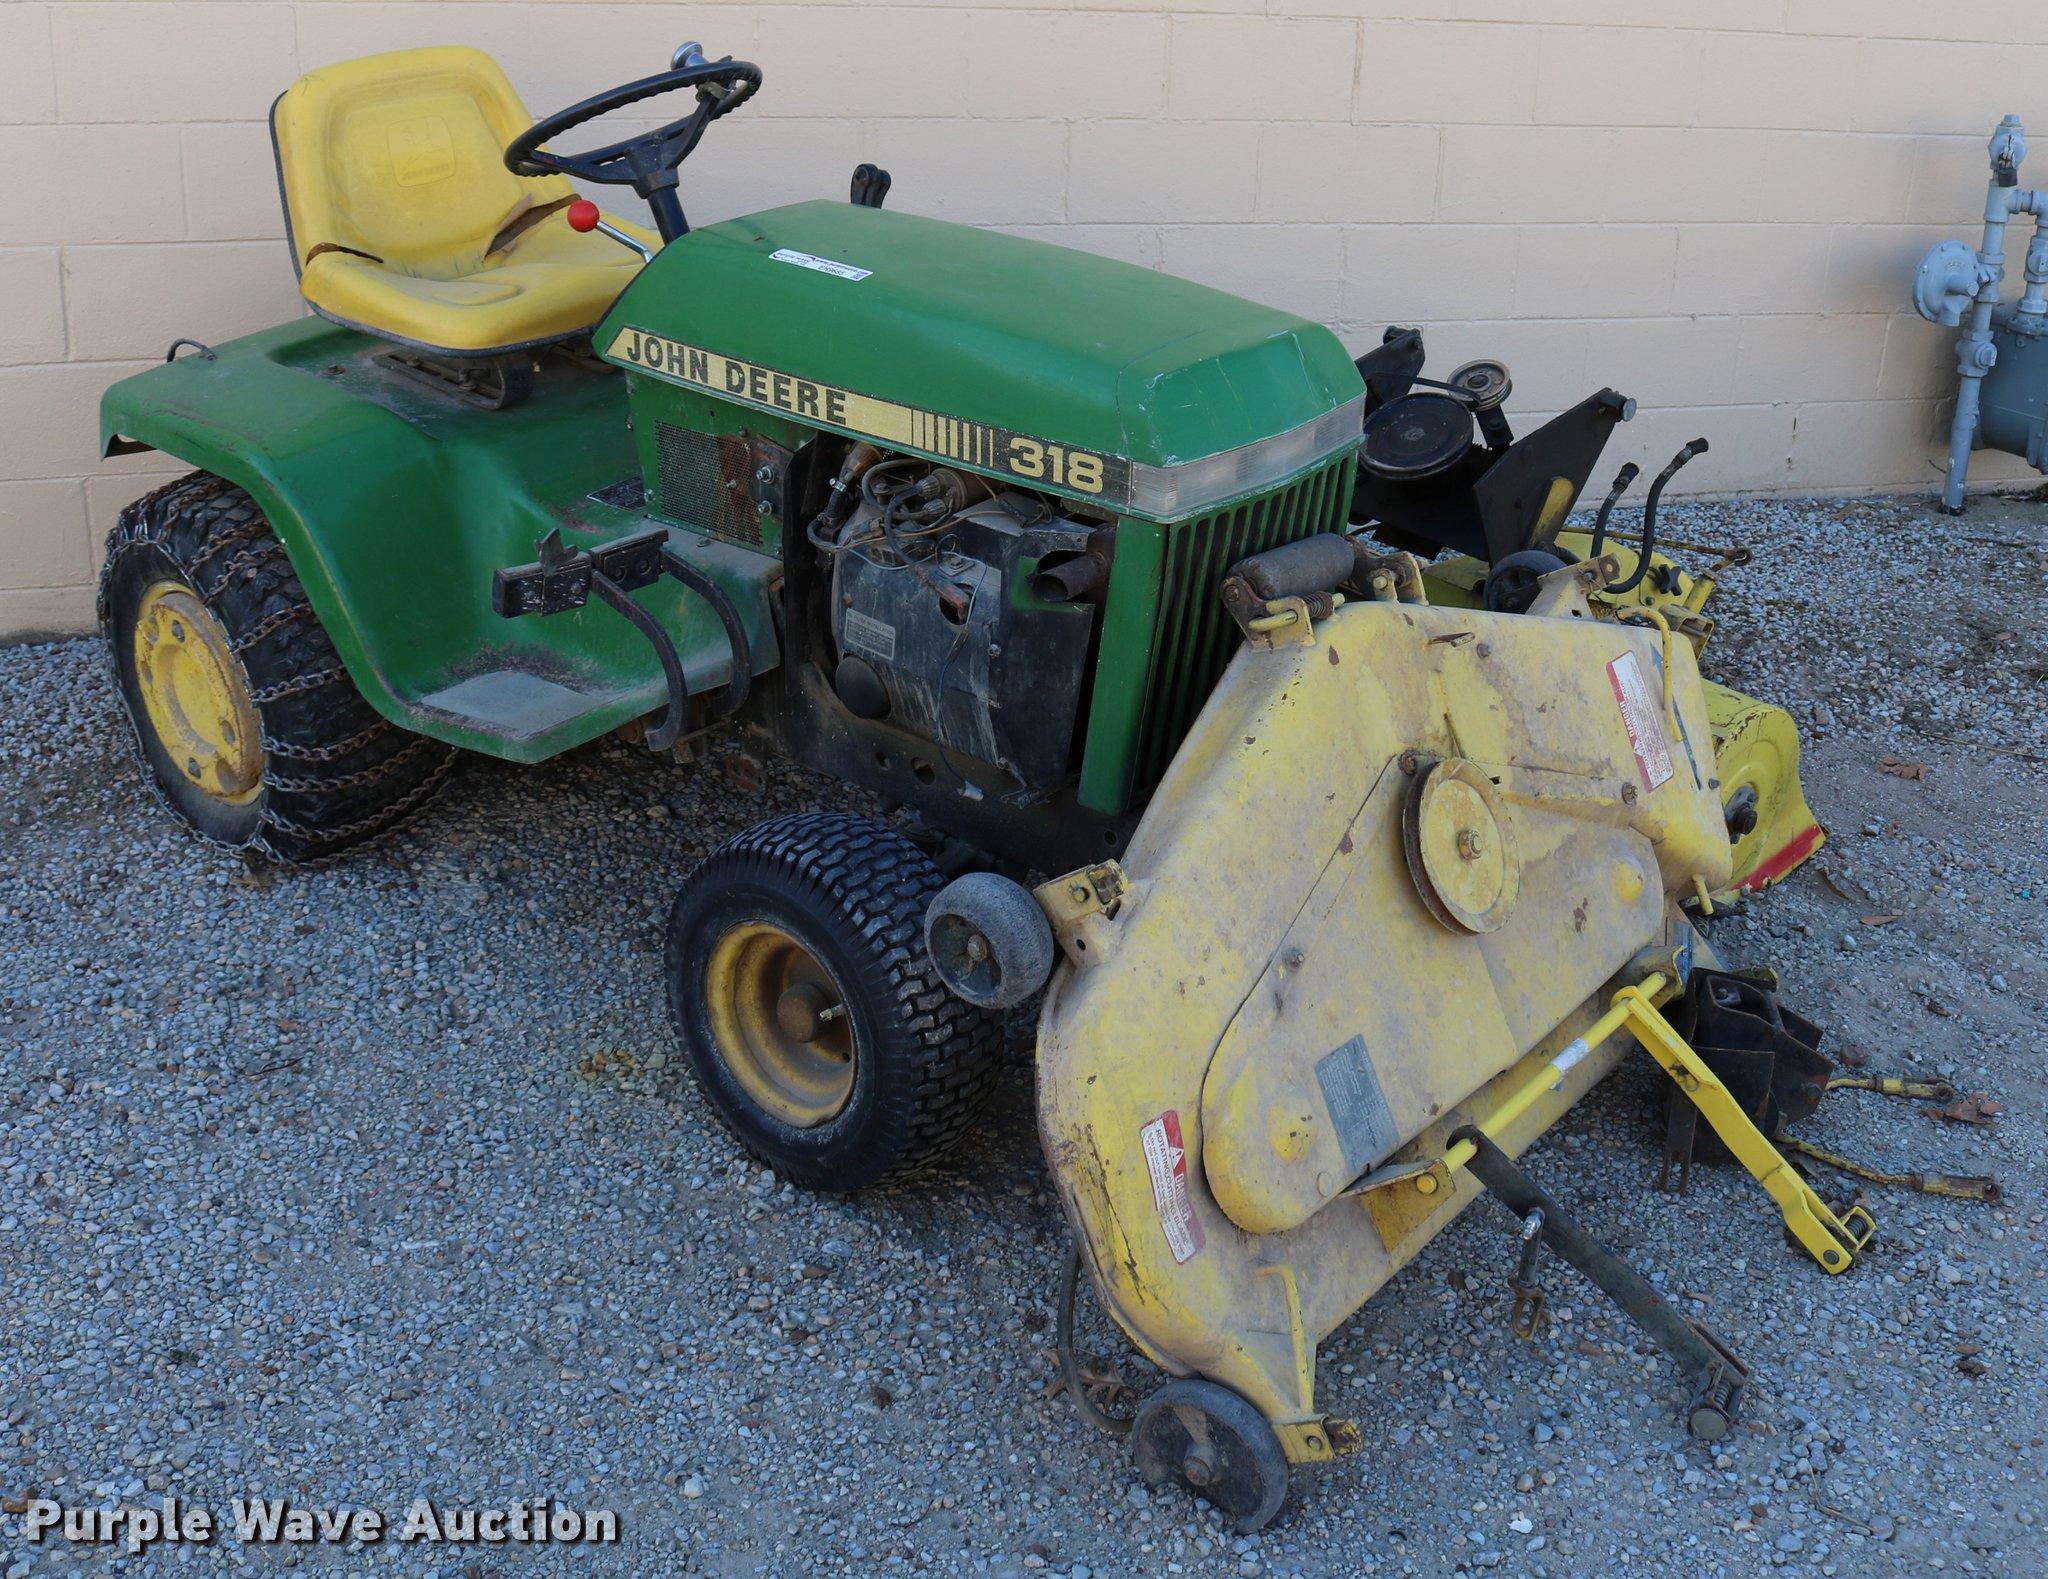 John Deere 318 lawn mower | Item EH9685 | SOLD! March 6 Gove